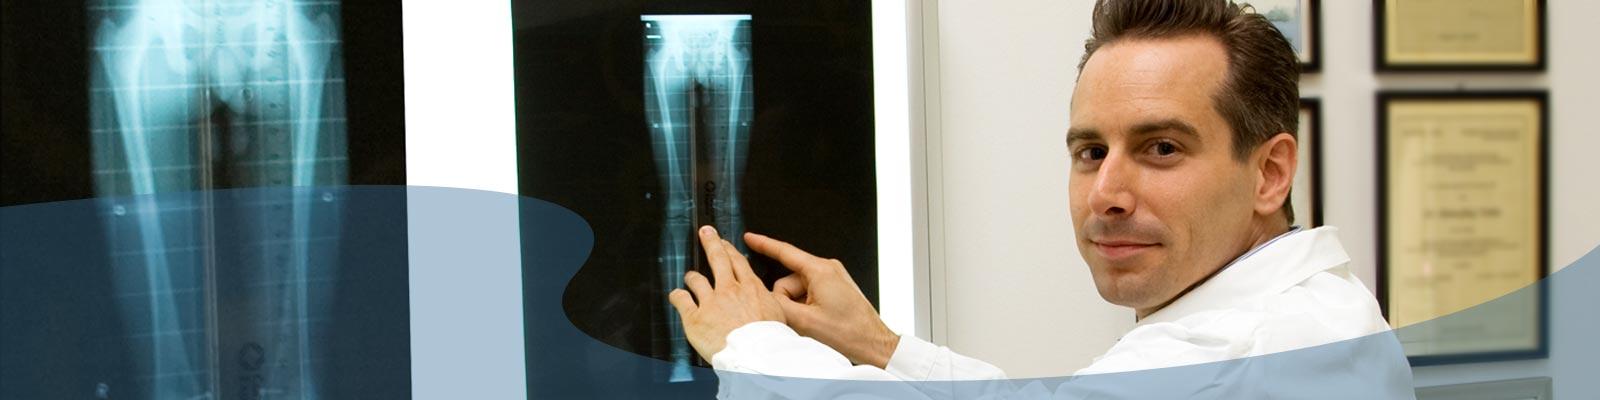 Dr. Radler Orthopädie Chirurgie Surgery